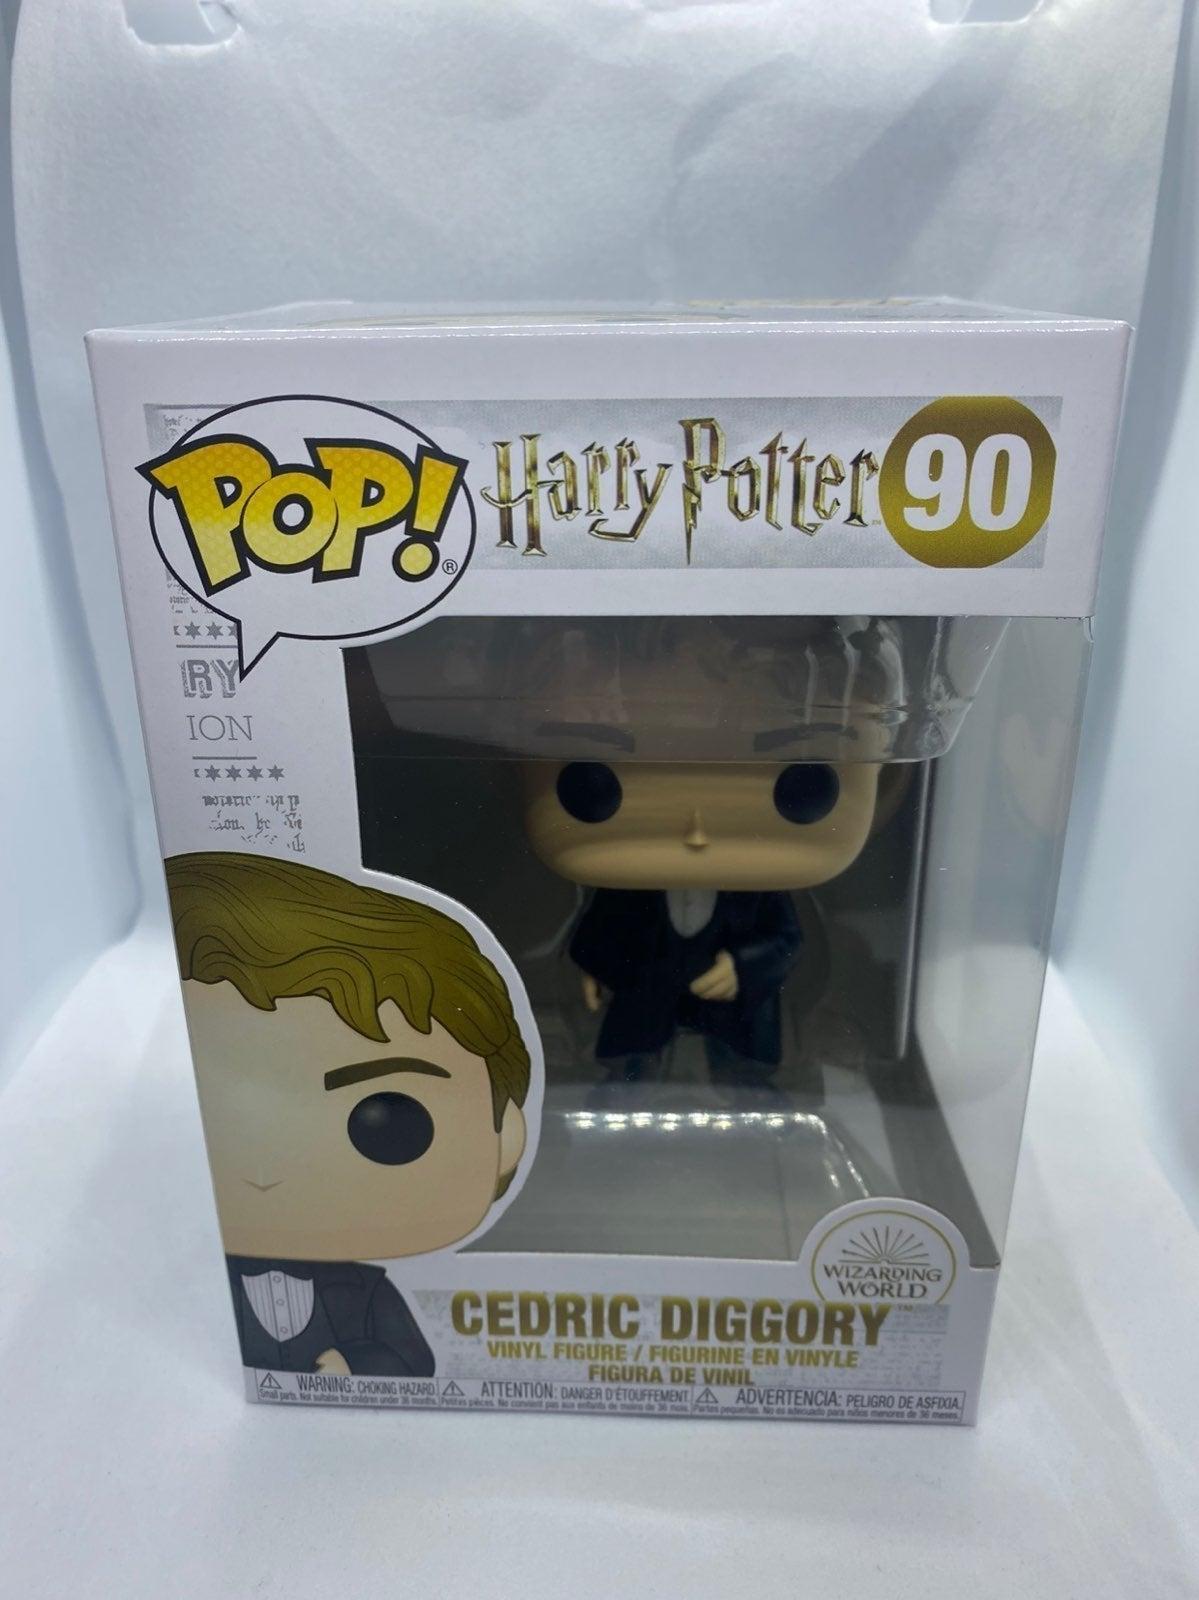 Cedric diggory Funko Pop